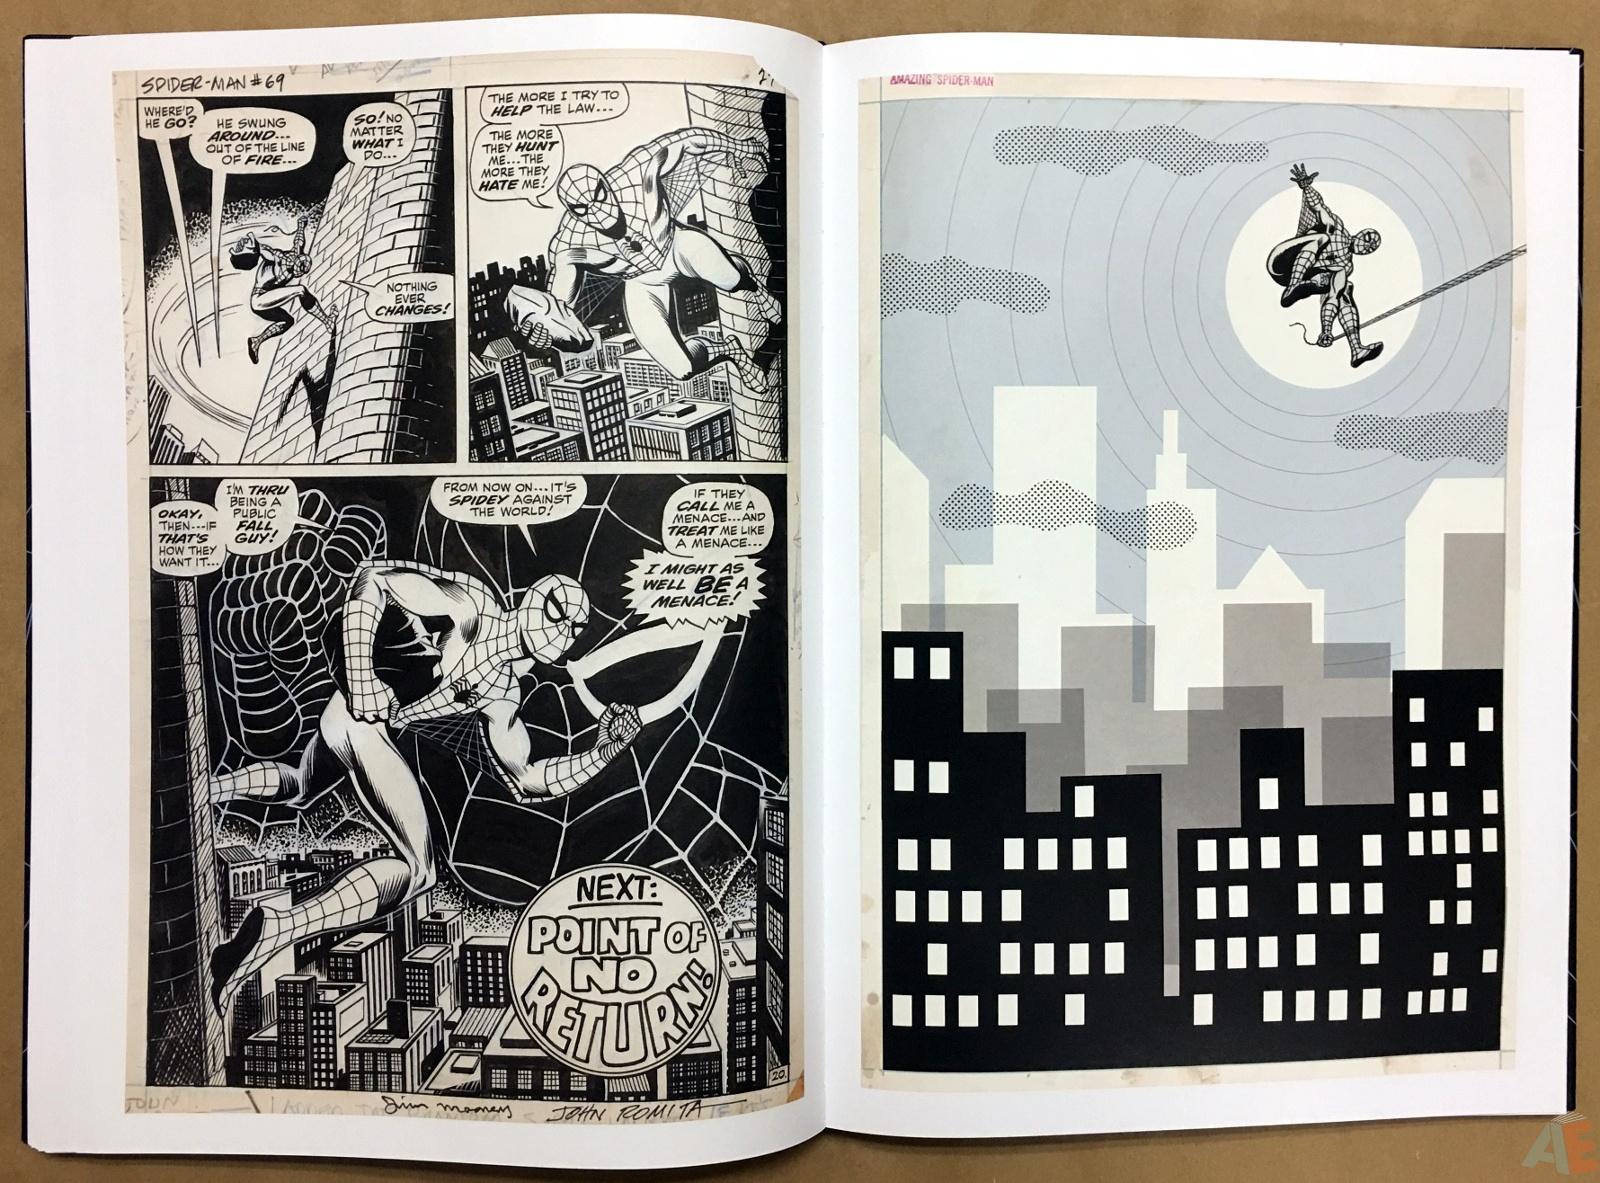 John Romita's The Amazing Spider-Man Artist's Edition 26